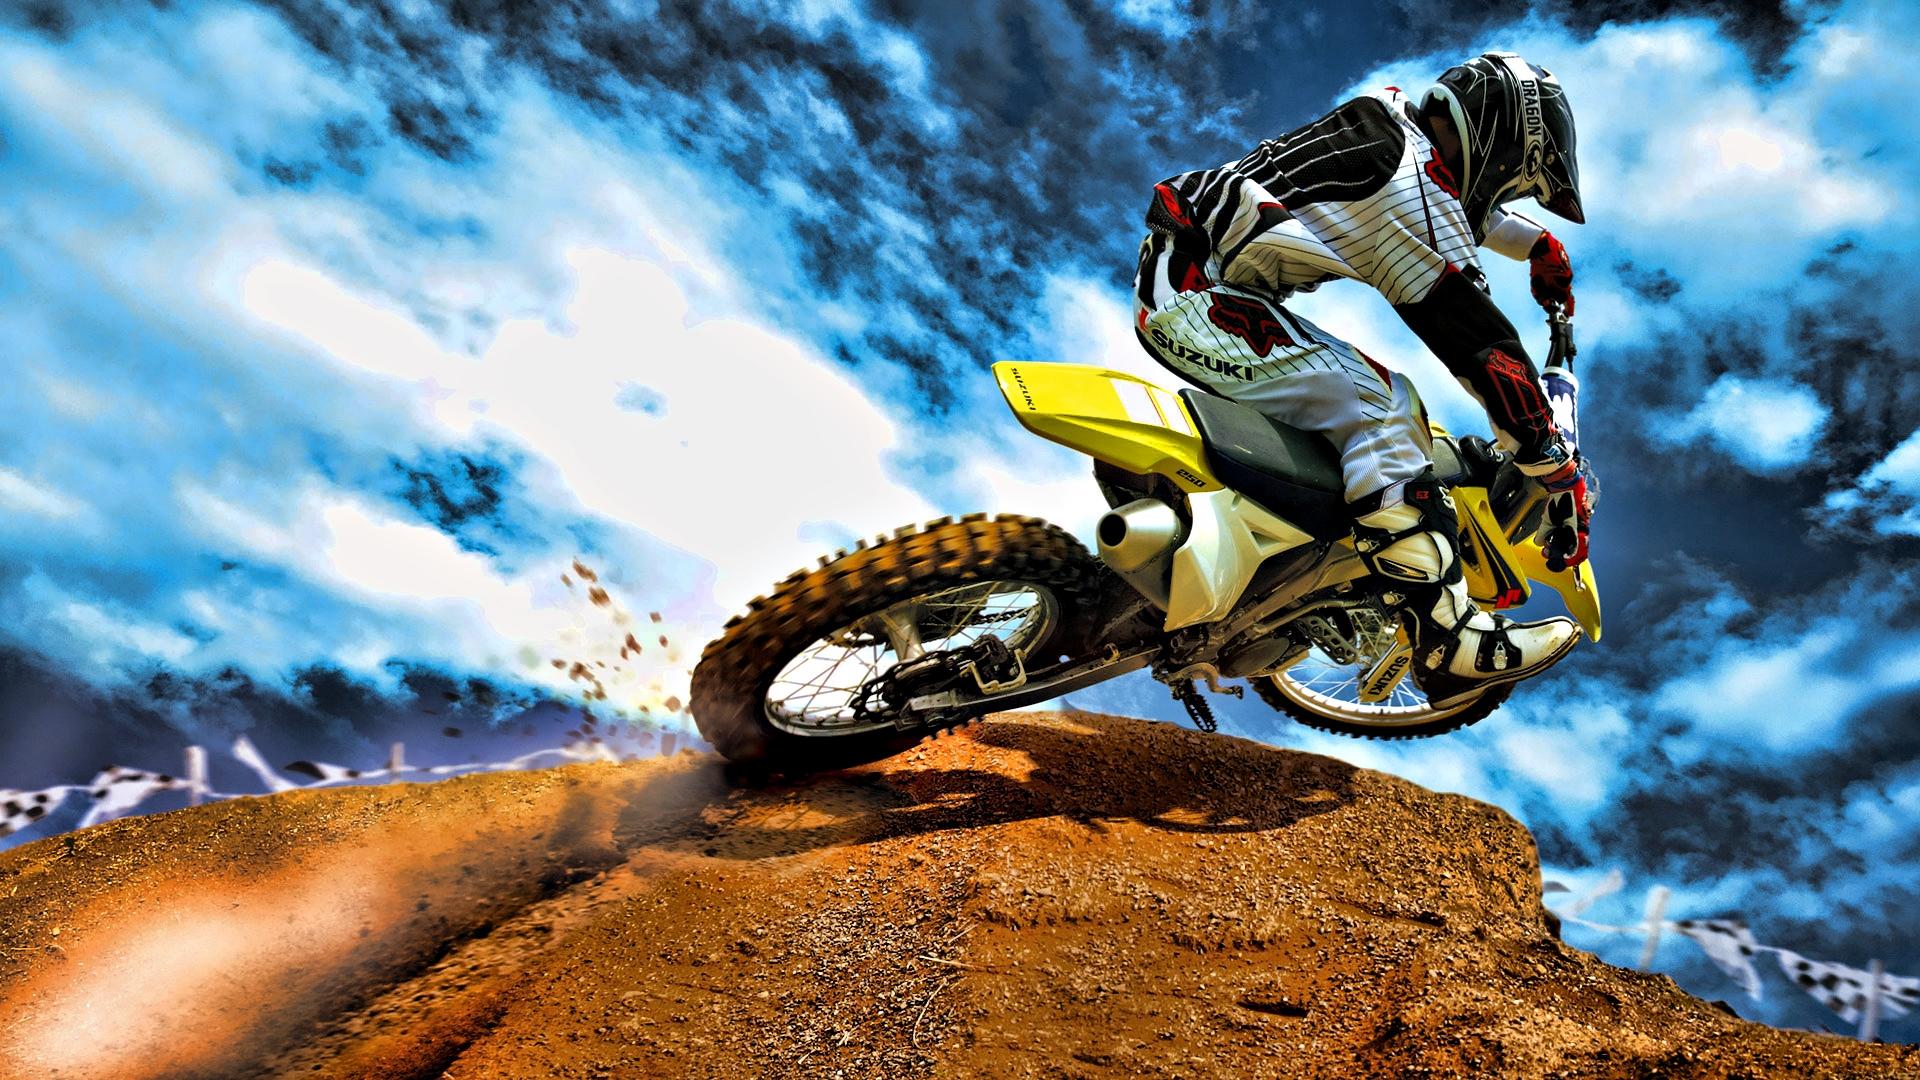 Motocross Backgrounds